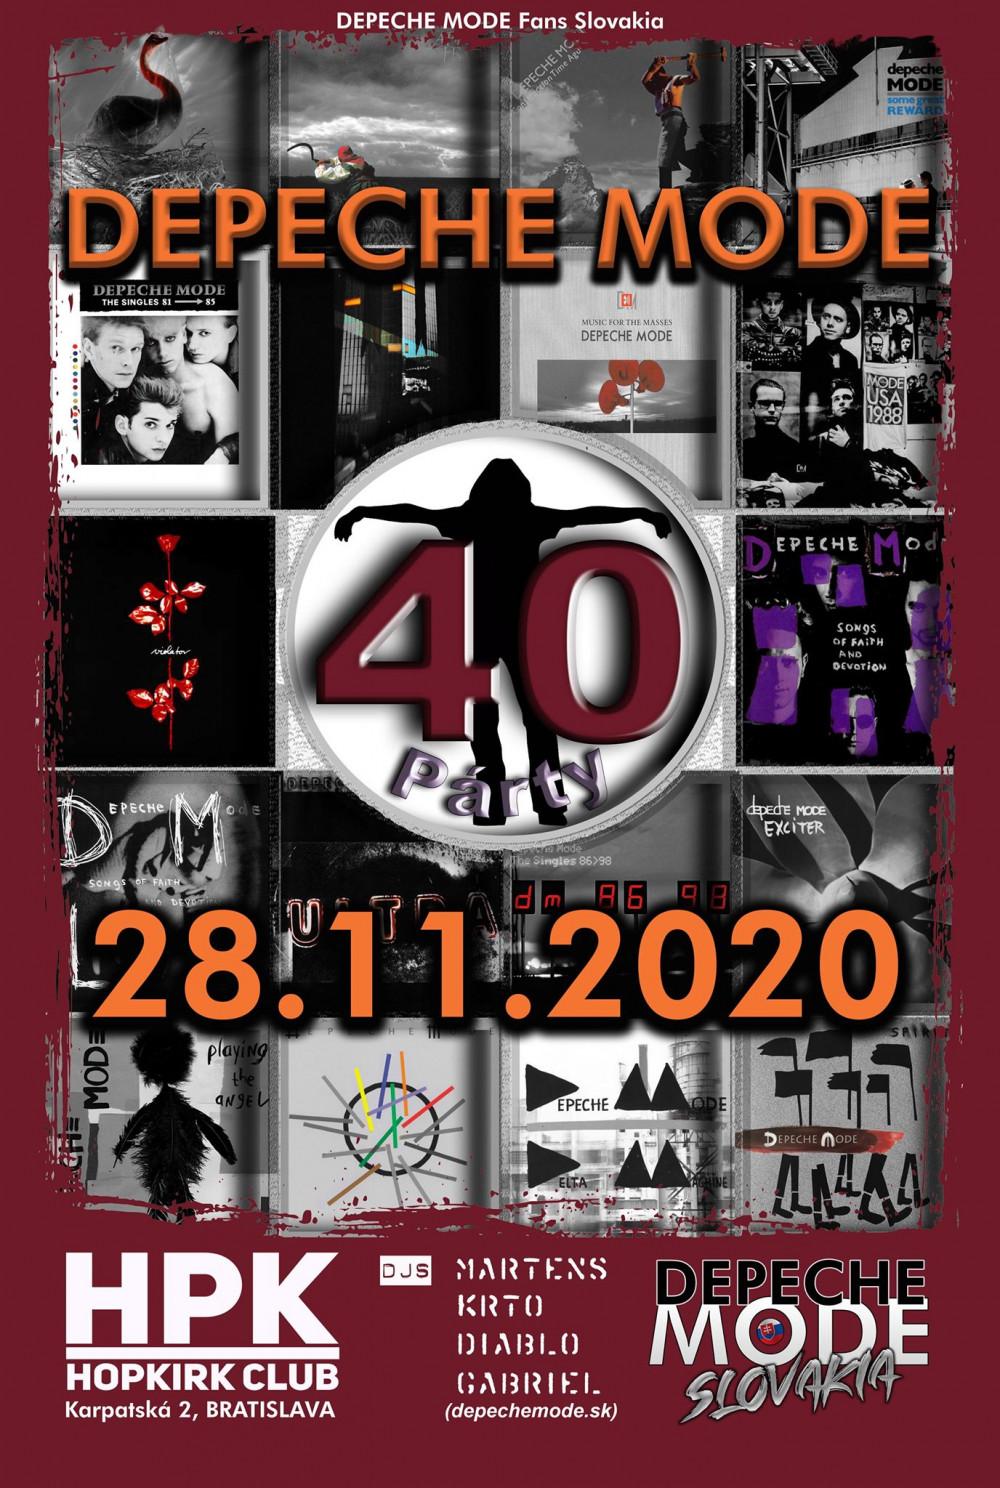 Bratislava: Depeche Mode 40 Party